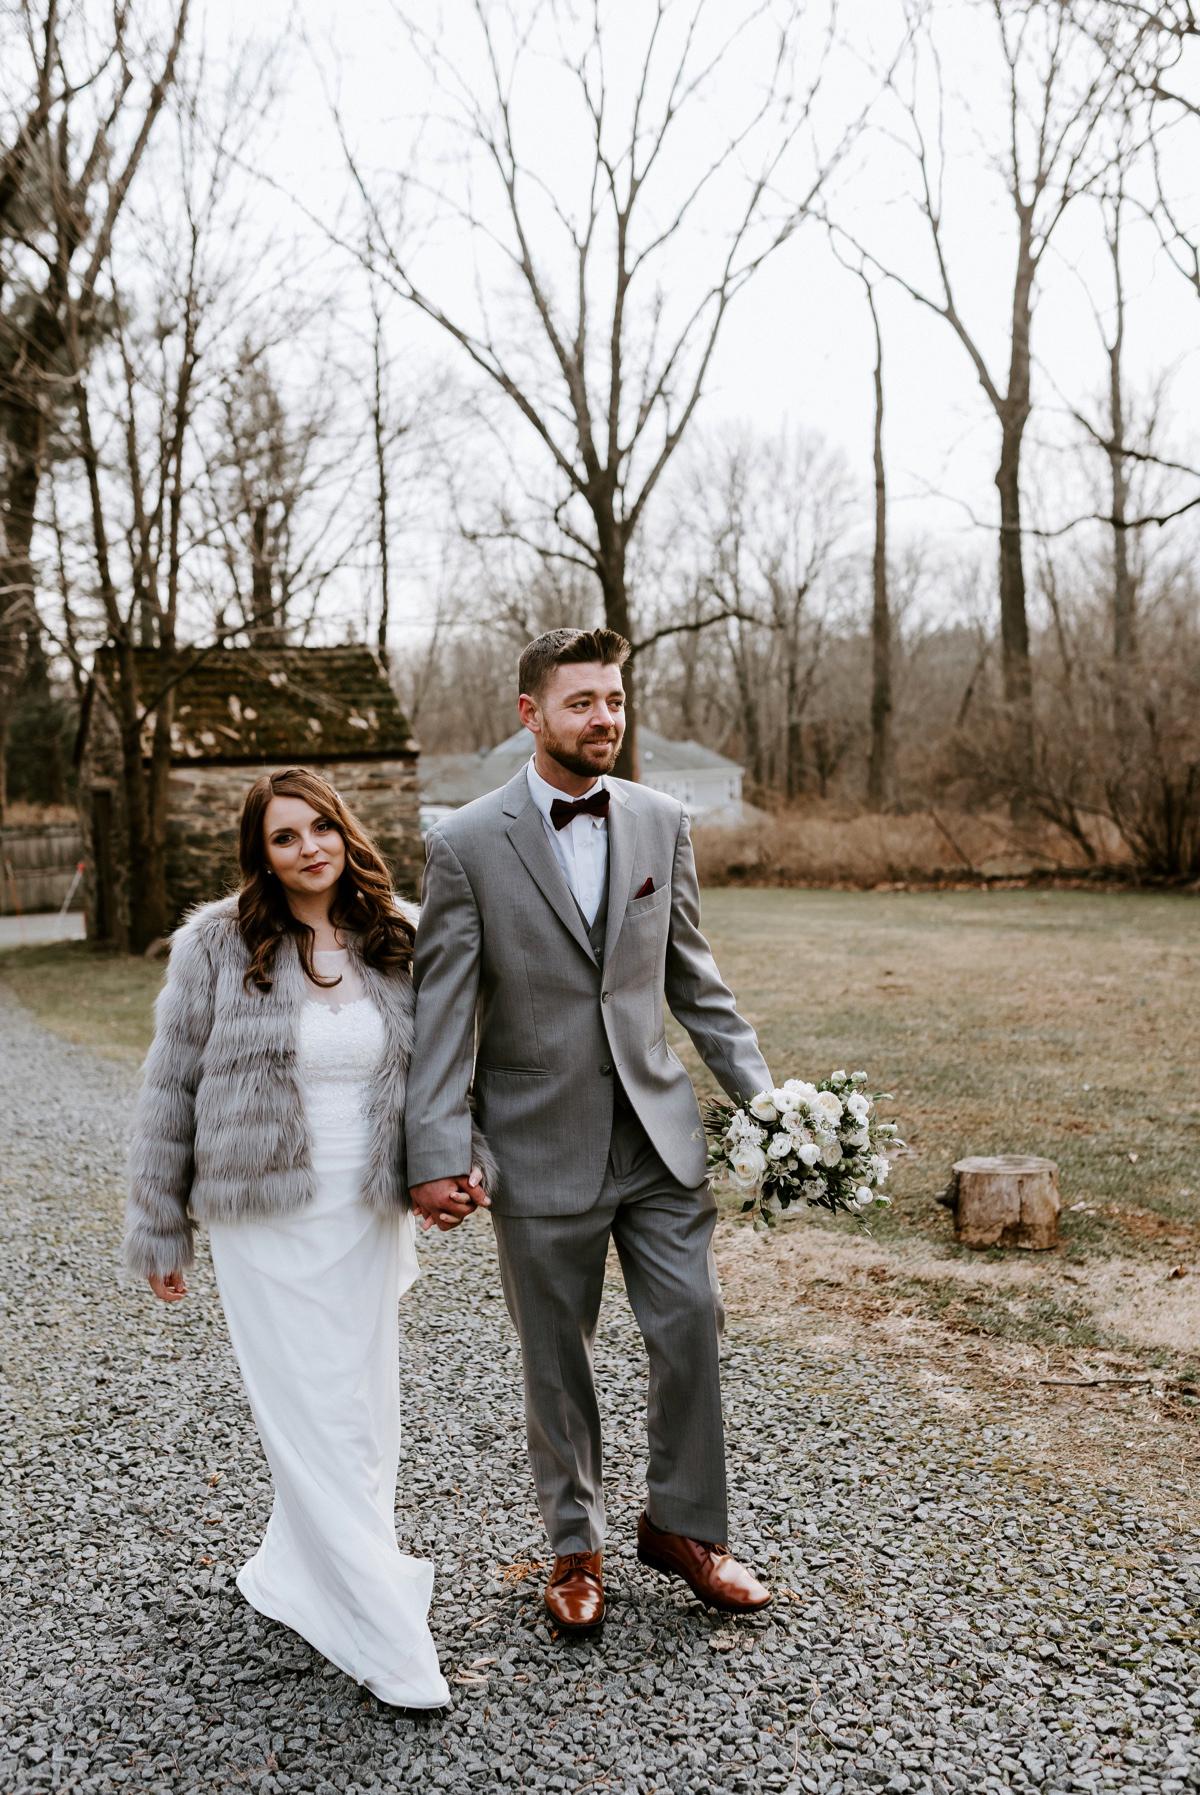 38 Winter Elopement Adventurous Elopement Photographer New Jersey Wedding Photographer Intimate Wedding